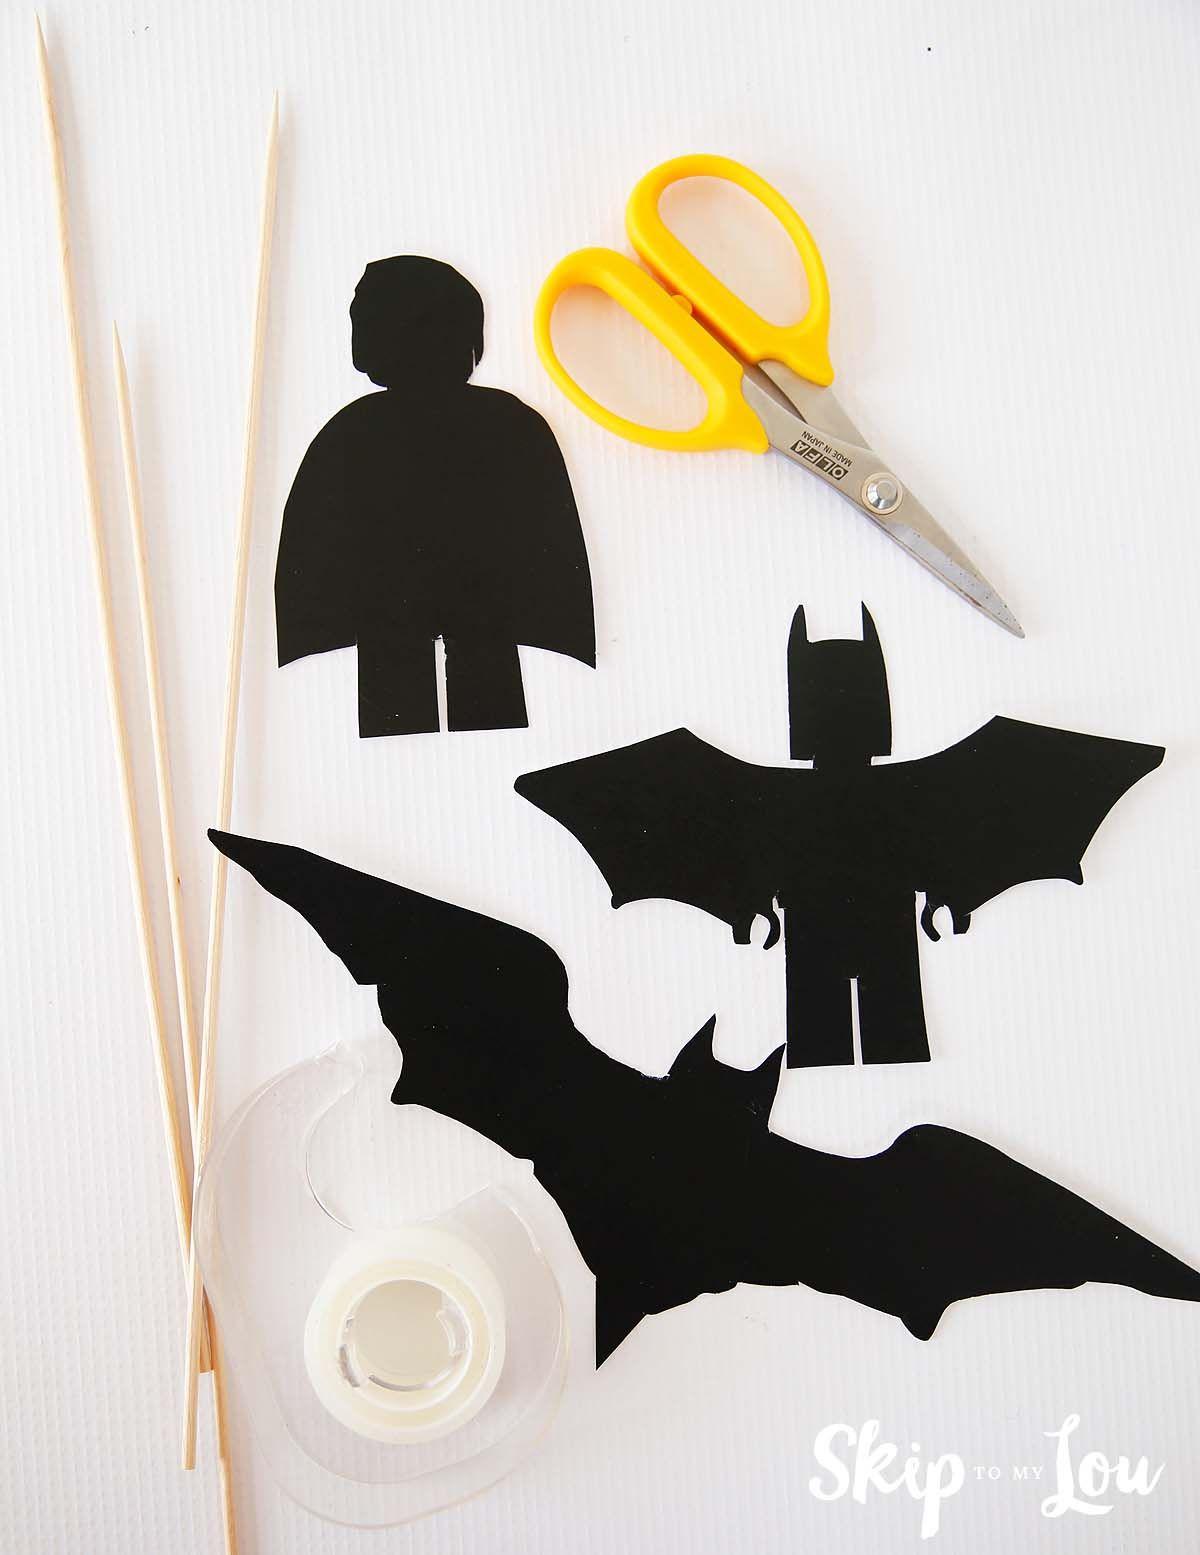 lego batman shadow puppets printables crafts printables